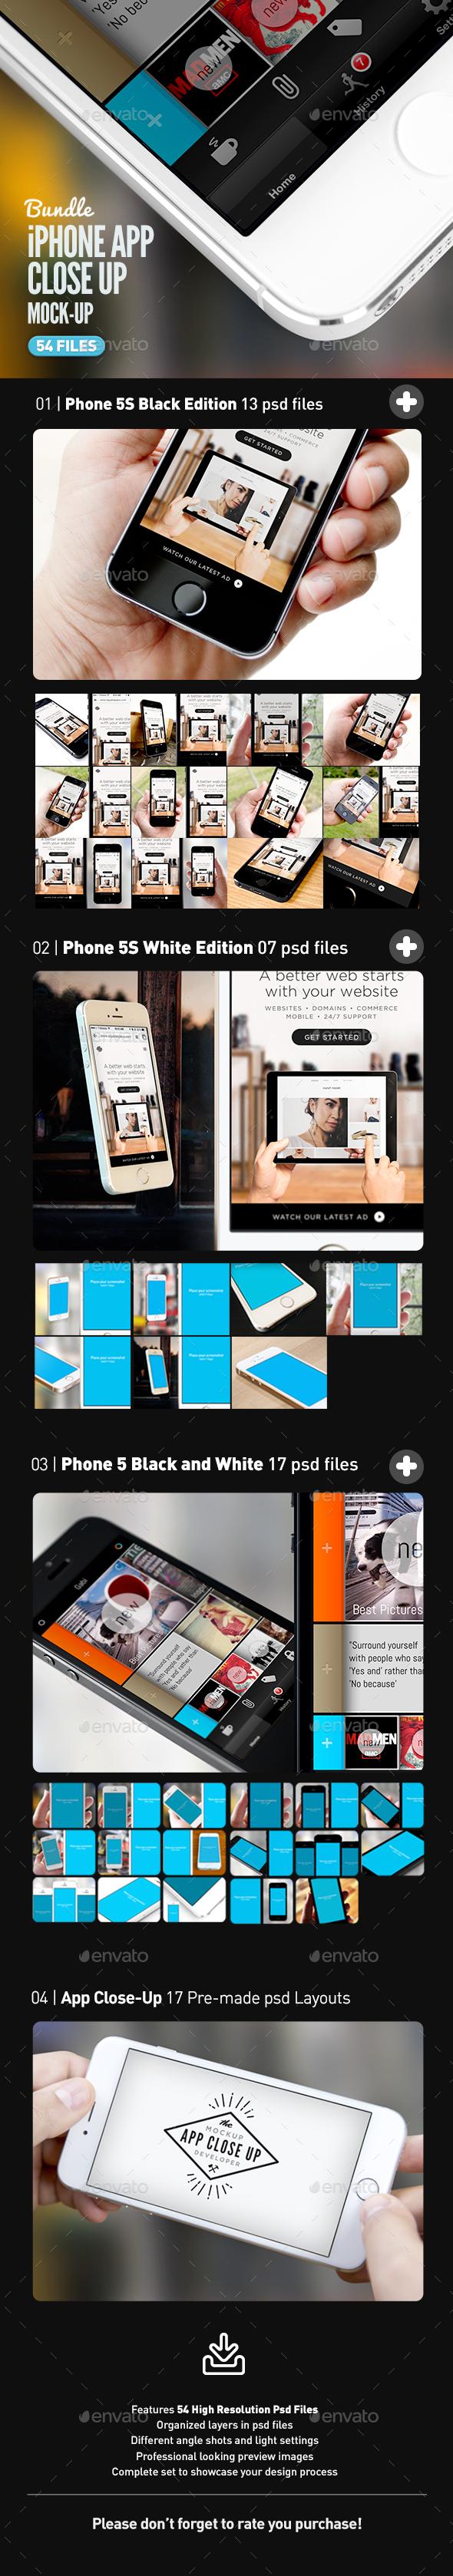 iPhone App UI Close-Up Mock-Up Bundle